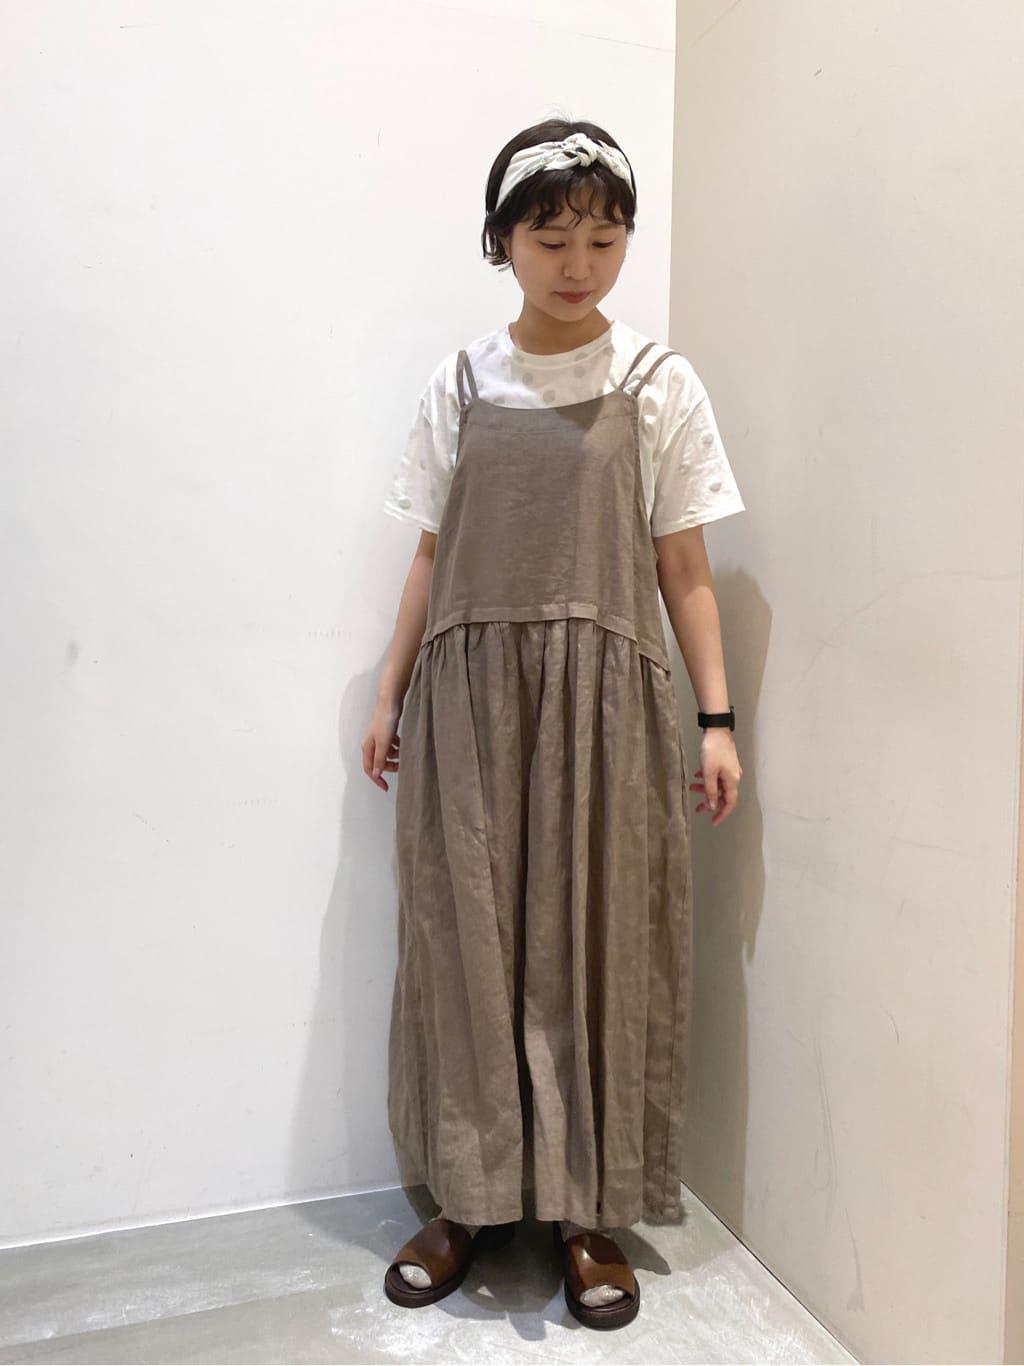 bulle de savon 阪急西宮ガーデンズ 身長:149cm 2021.08.13